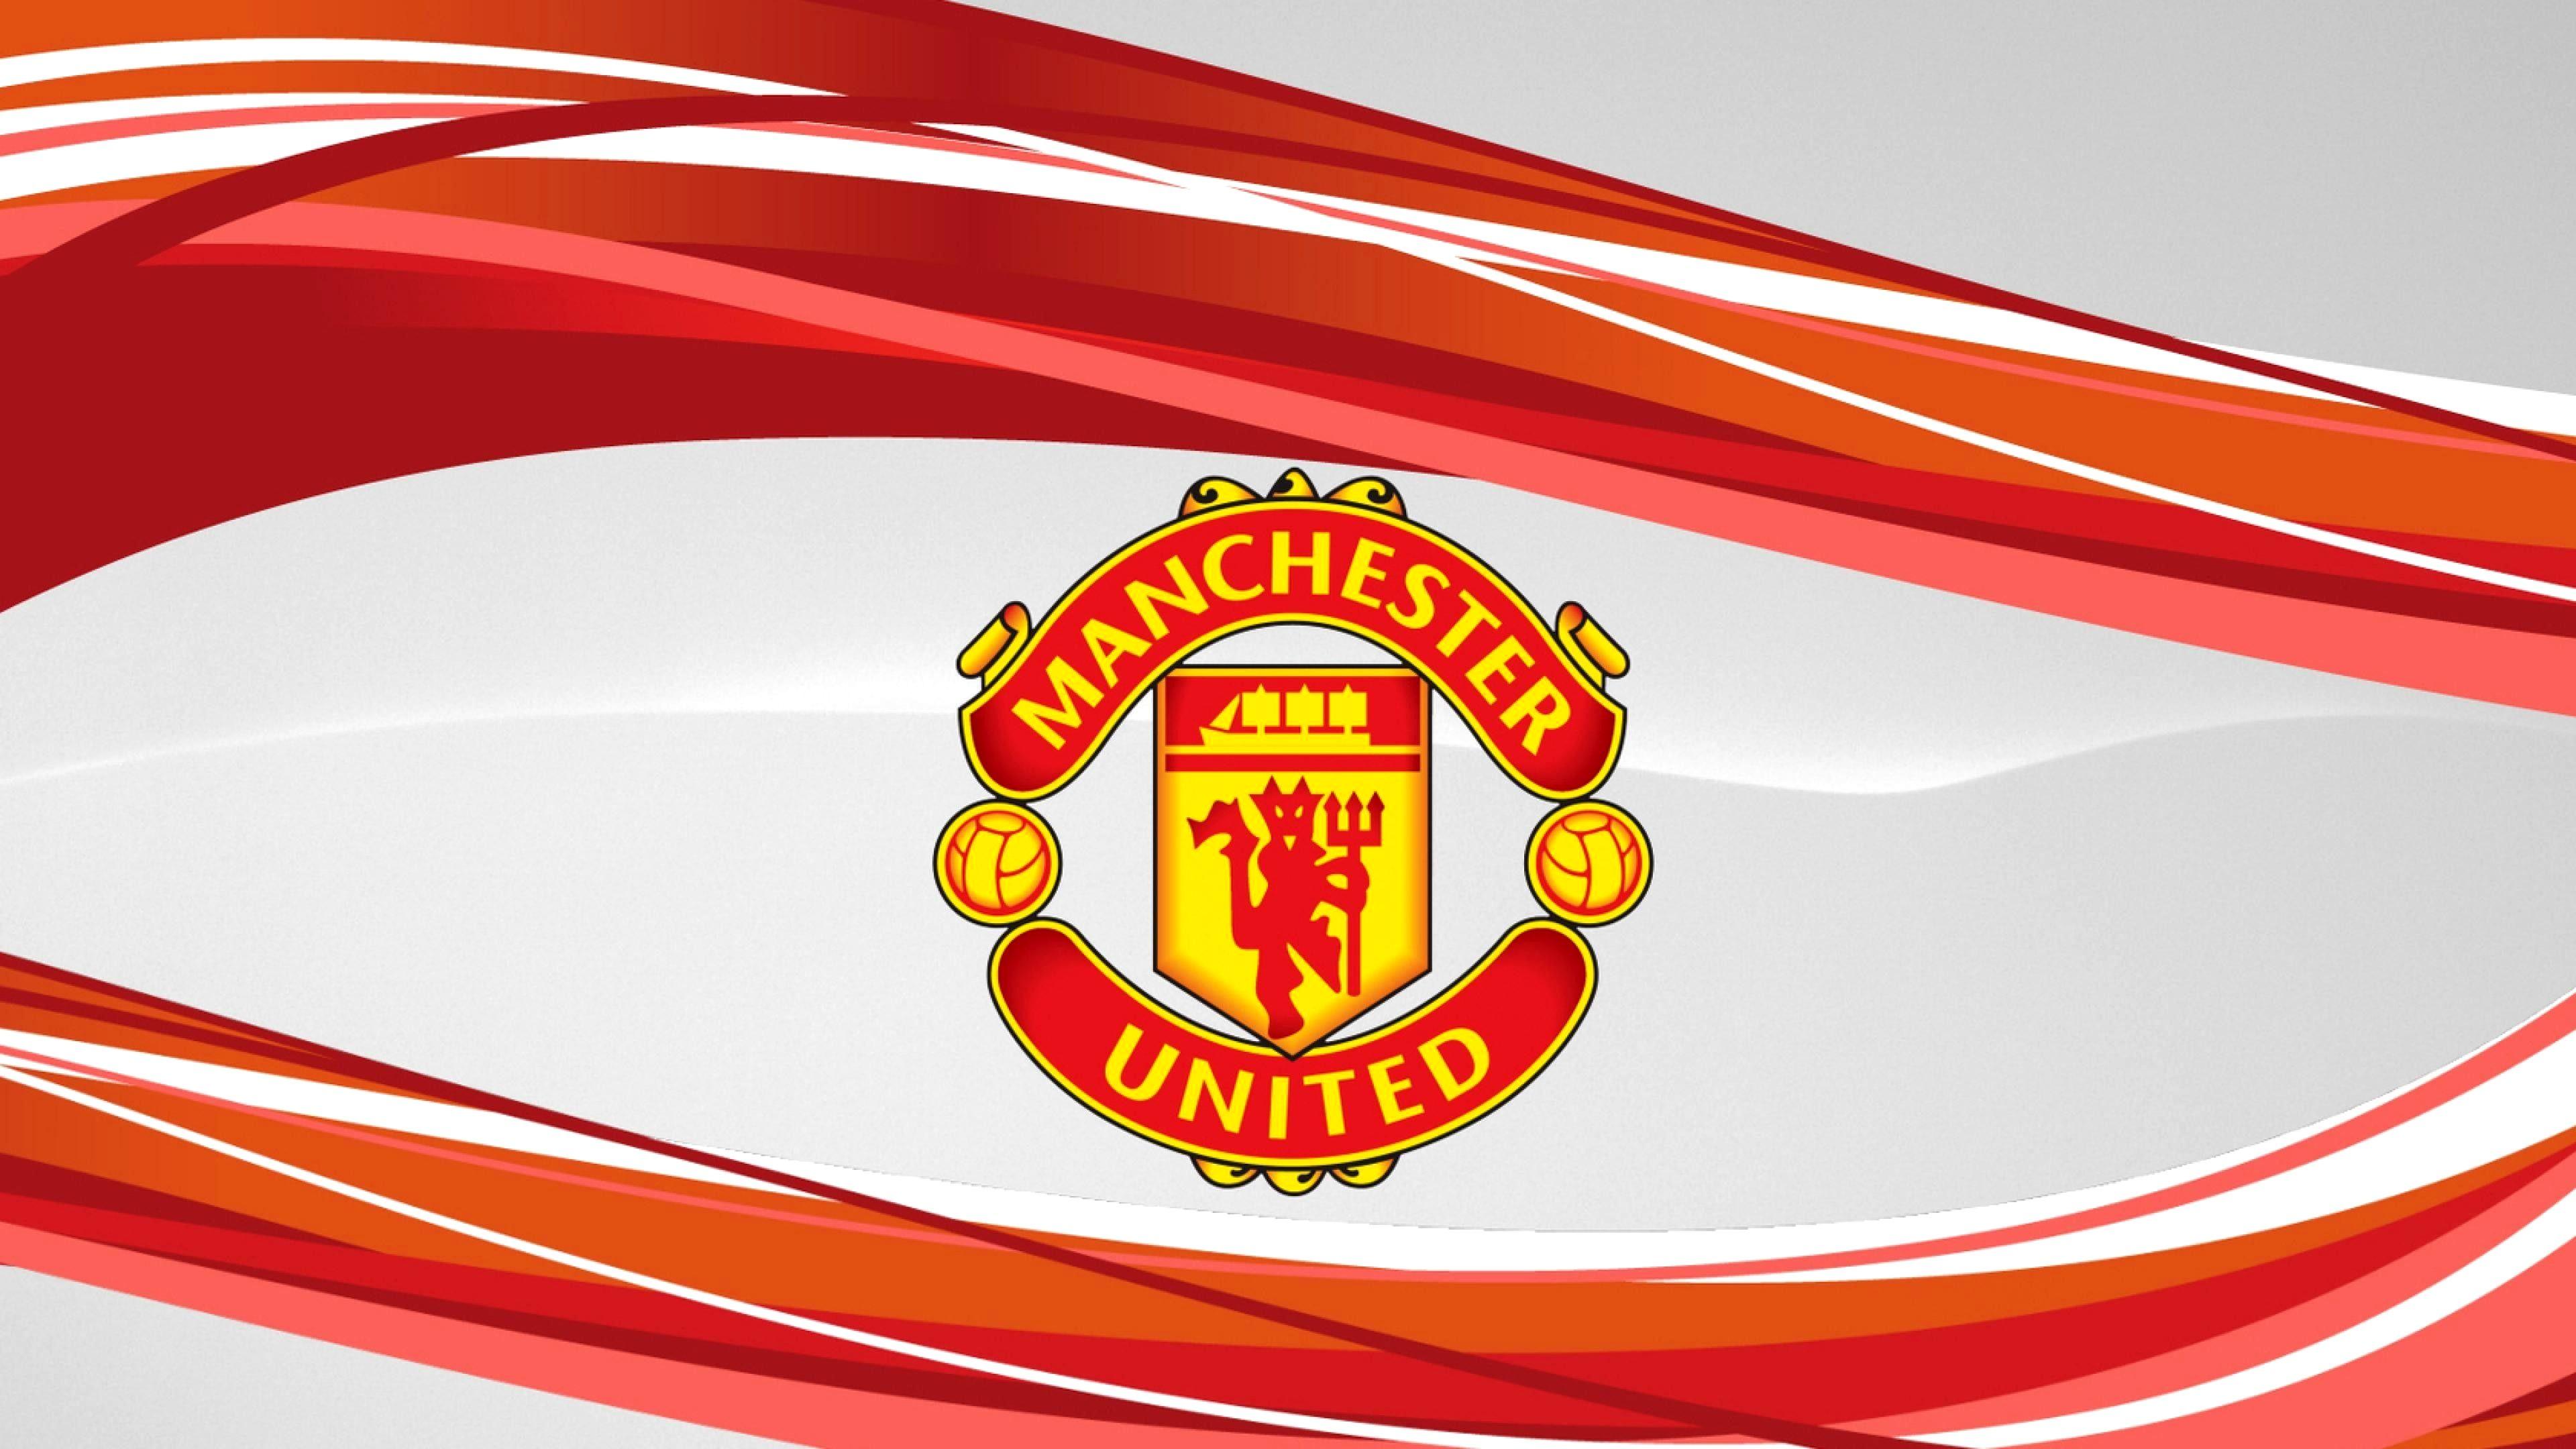 Iphone X Wallpaper 4k Manchester United Trick Estilo